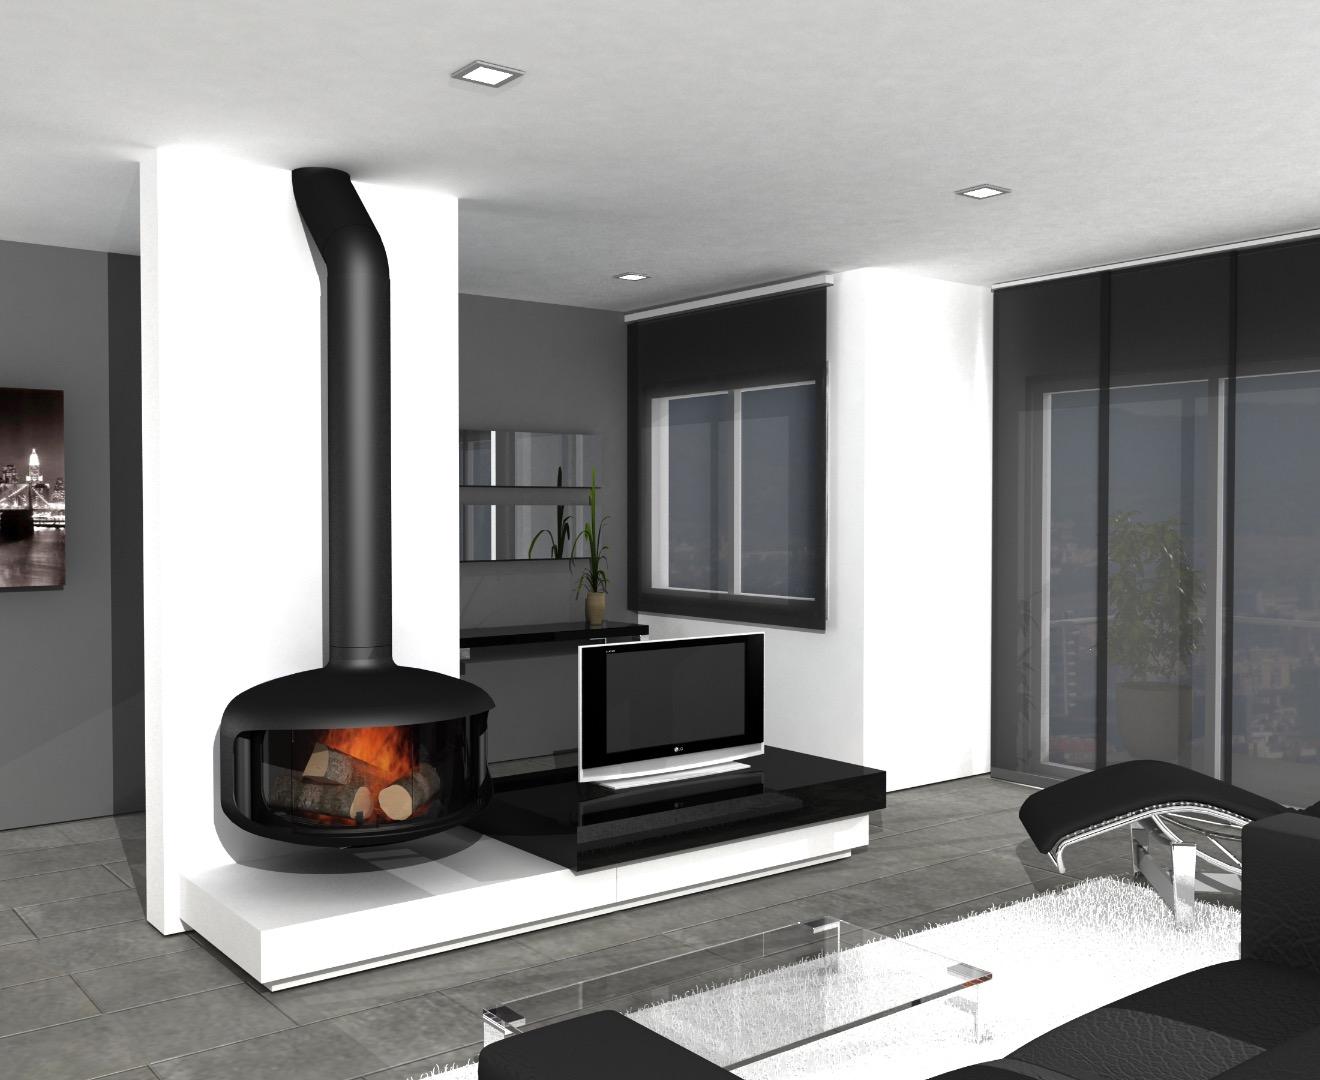 Aquastil chimeneas y calefacci n de biomasa pellets - Chimeneas de pared modernas ...